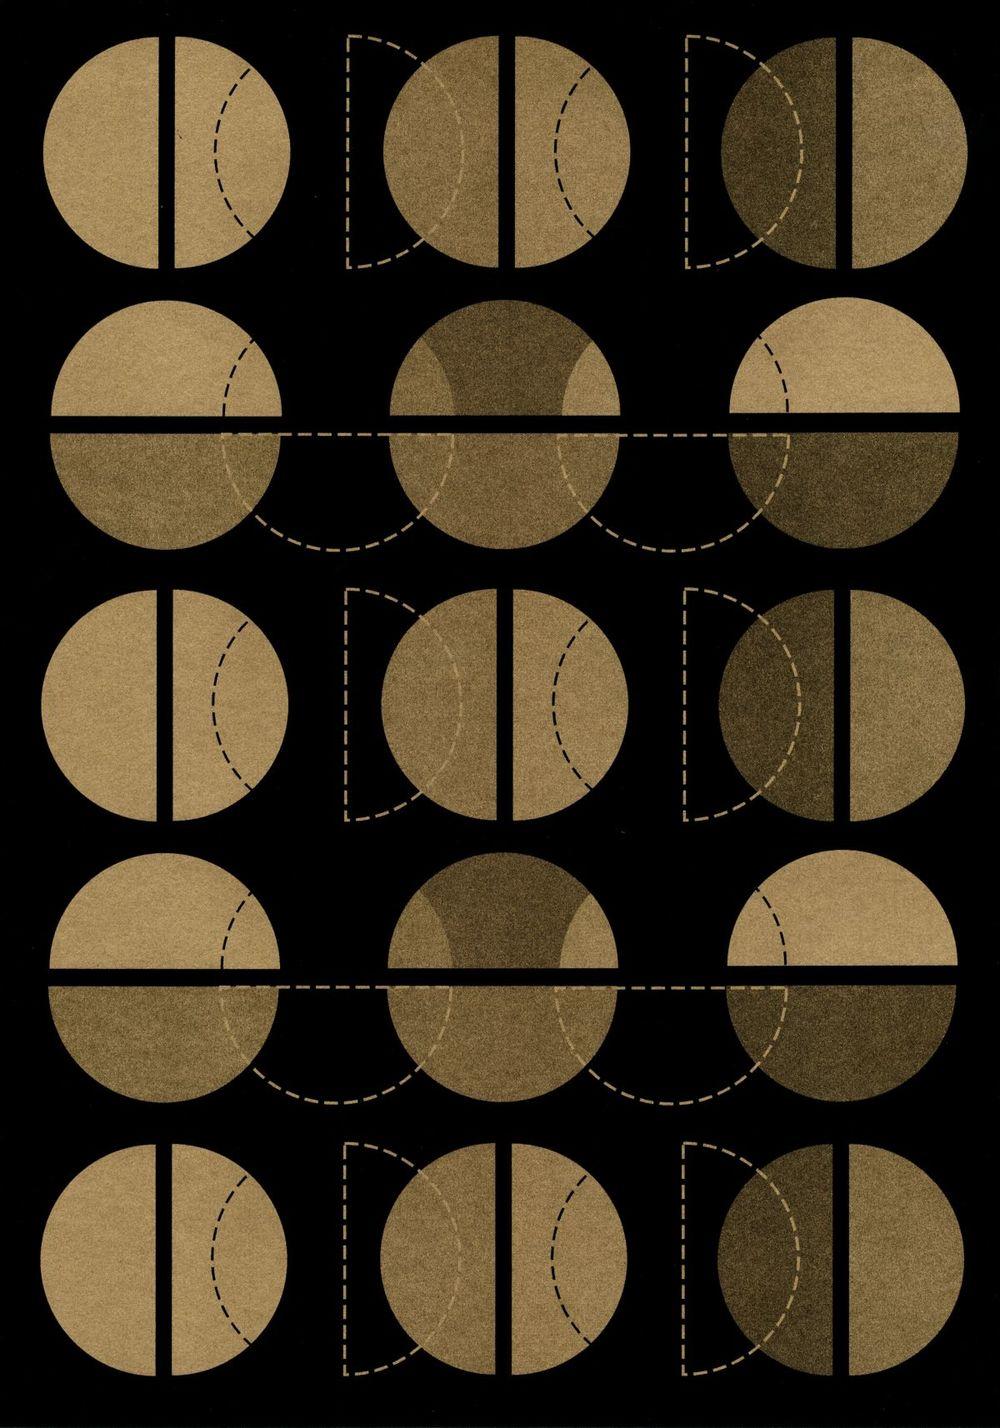 clare-birtwistle-gold-print